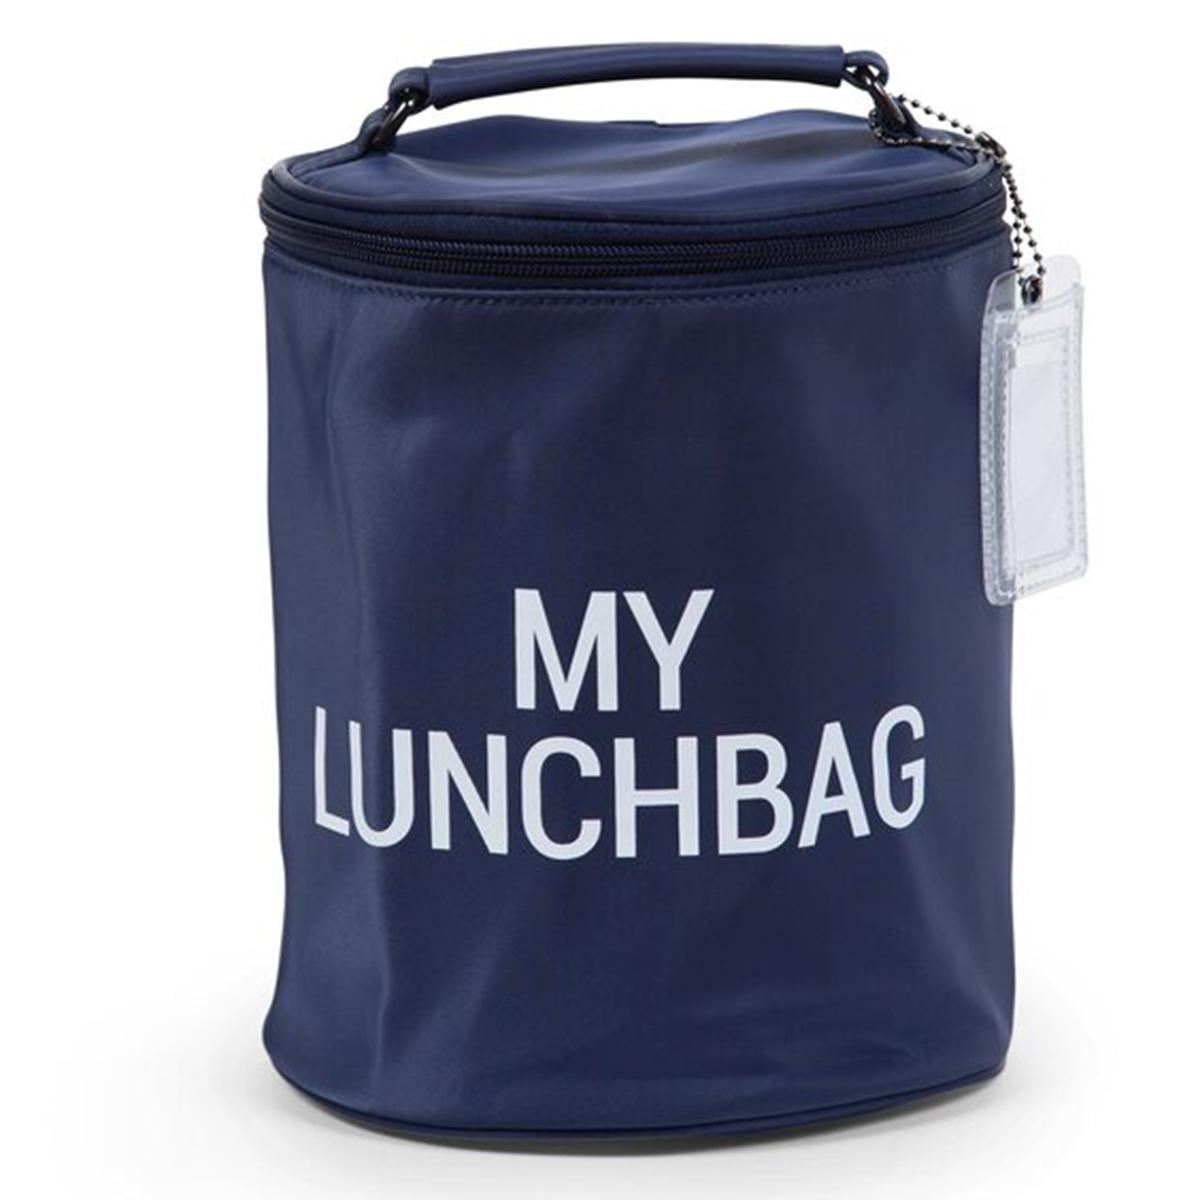 Sac isotherme My Lunchbag - Bleu Marine et Blanc My Lunchbag - Bleu Marine et Blanc